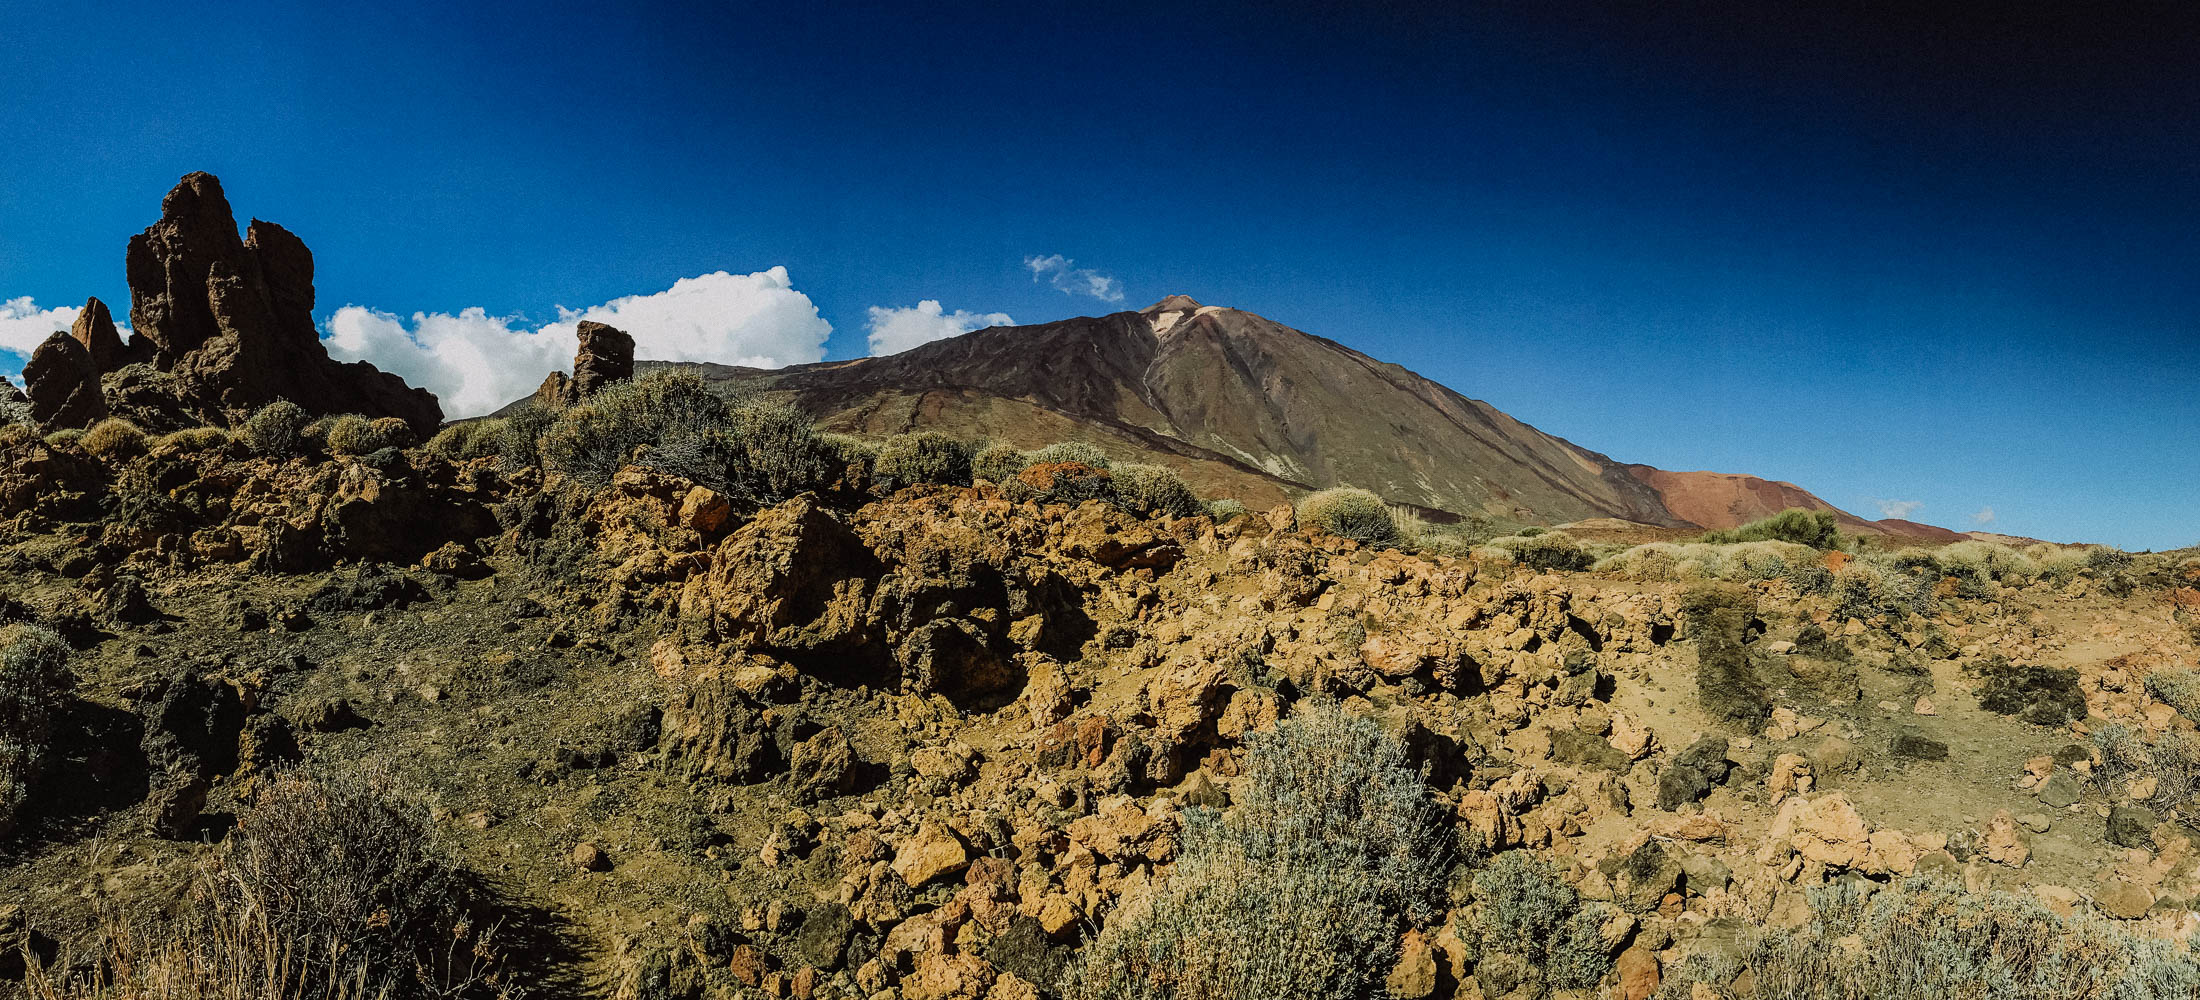 teneriffa-landscape-3920.jpg